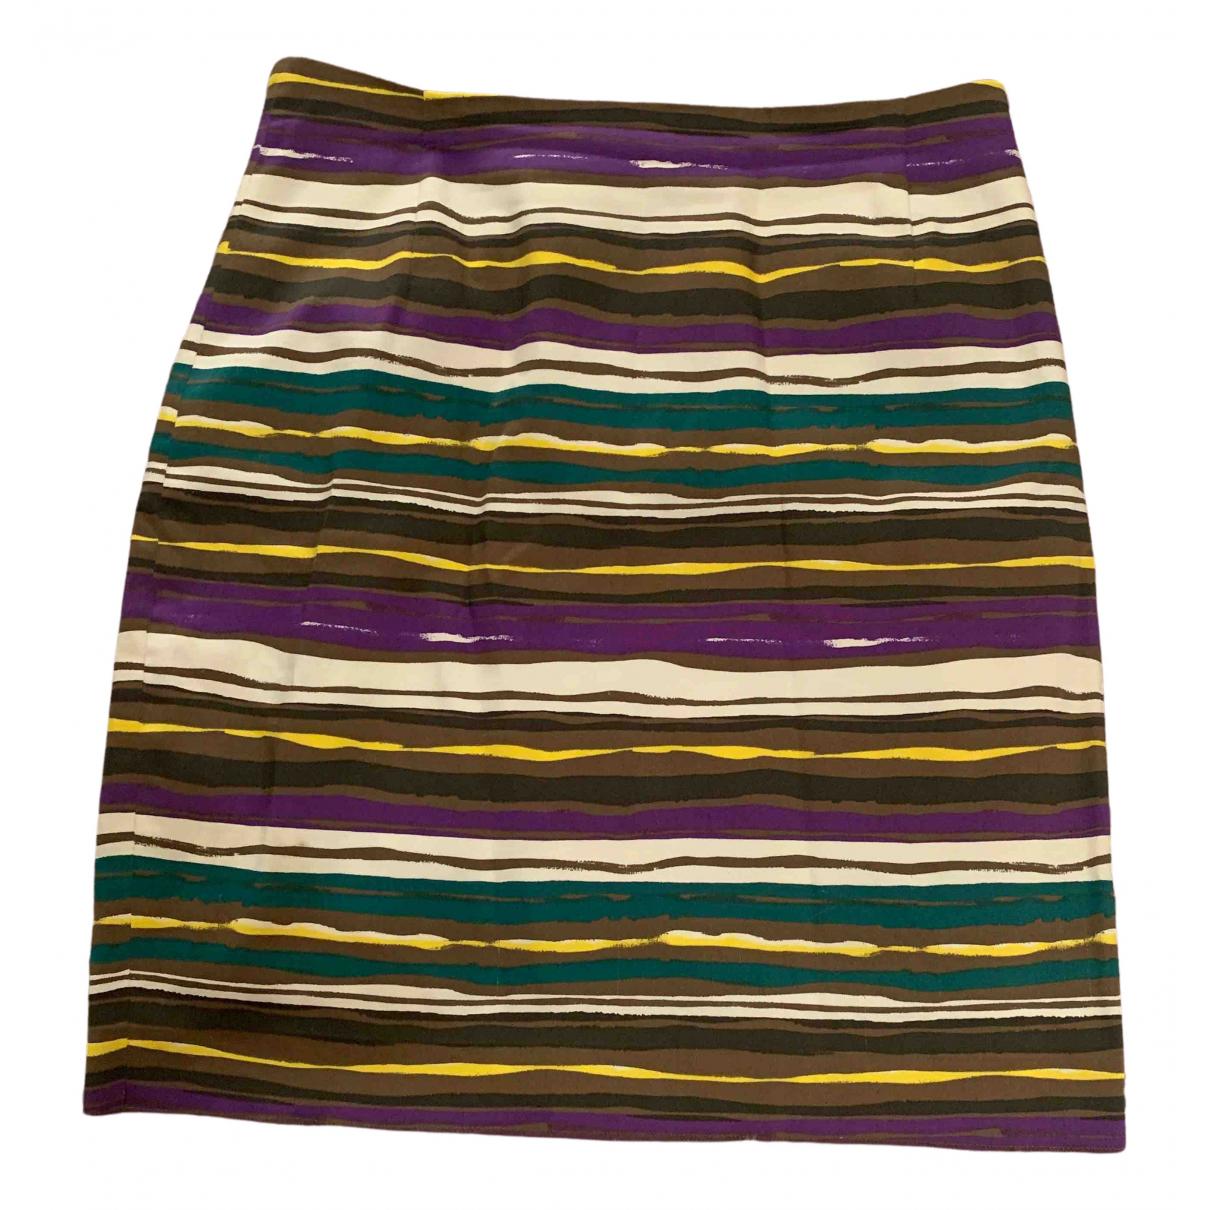 Max Mara Studio \N Multicolour Cotton skirt for Women M International